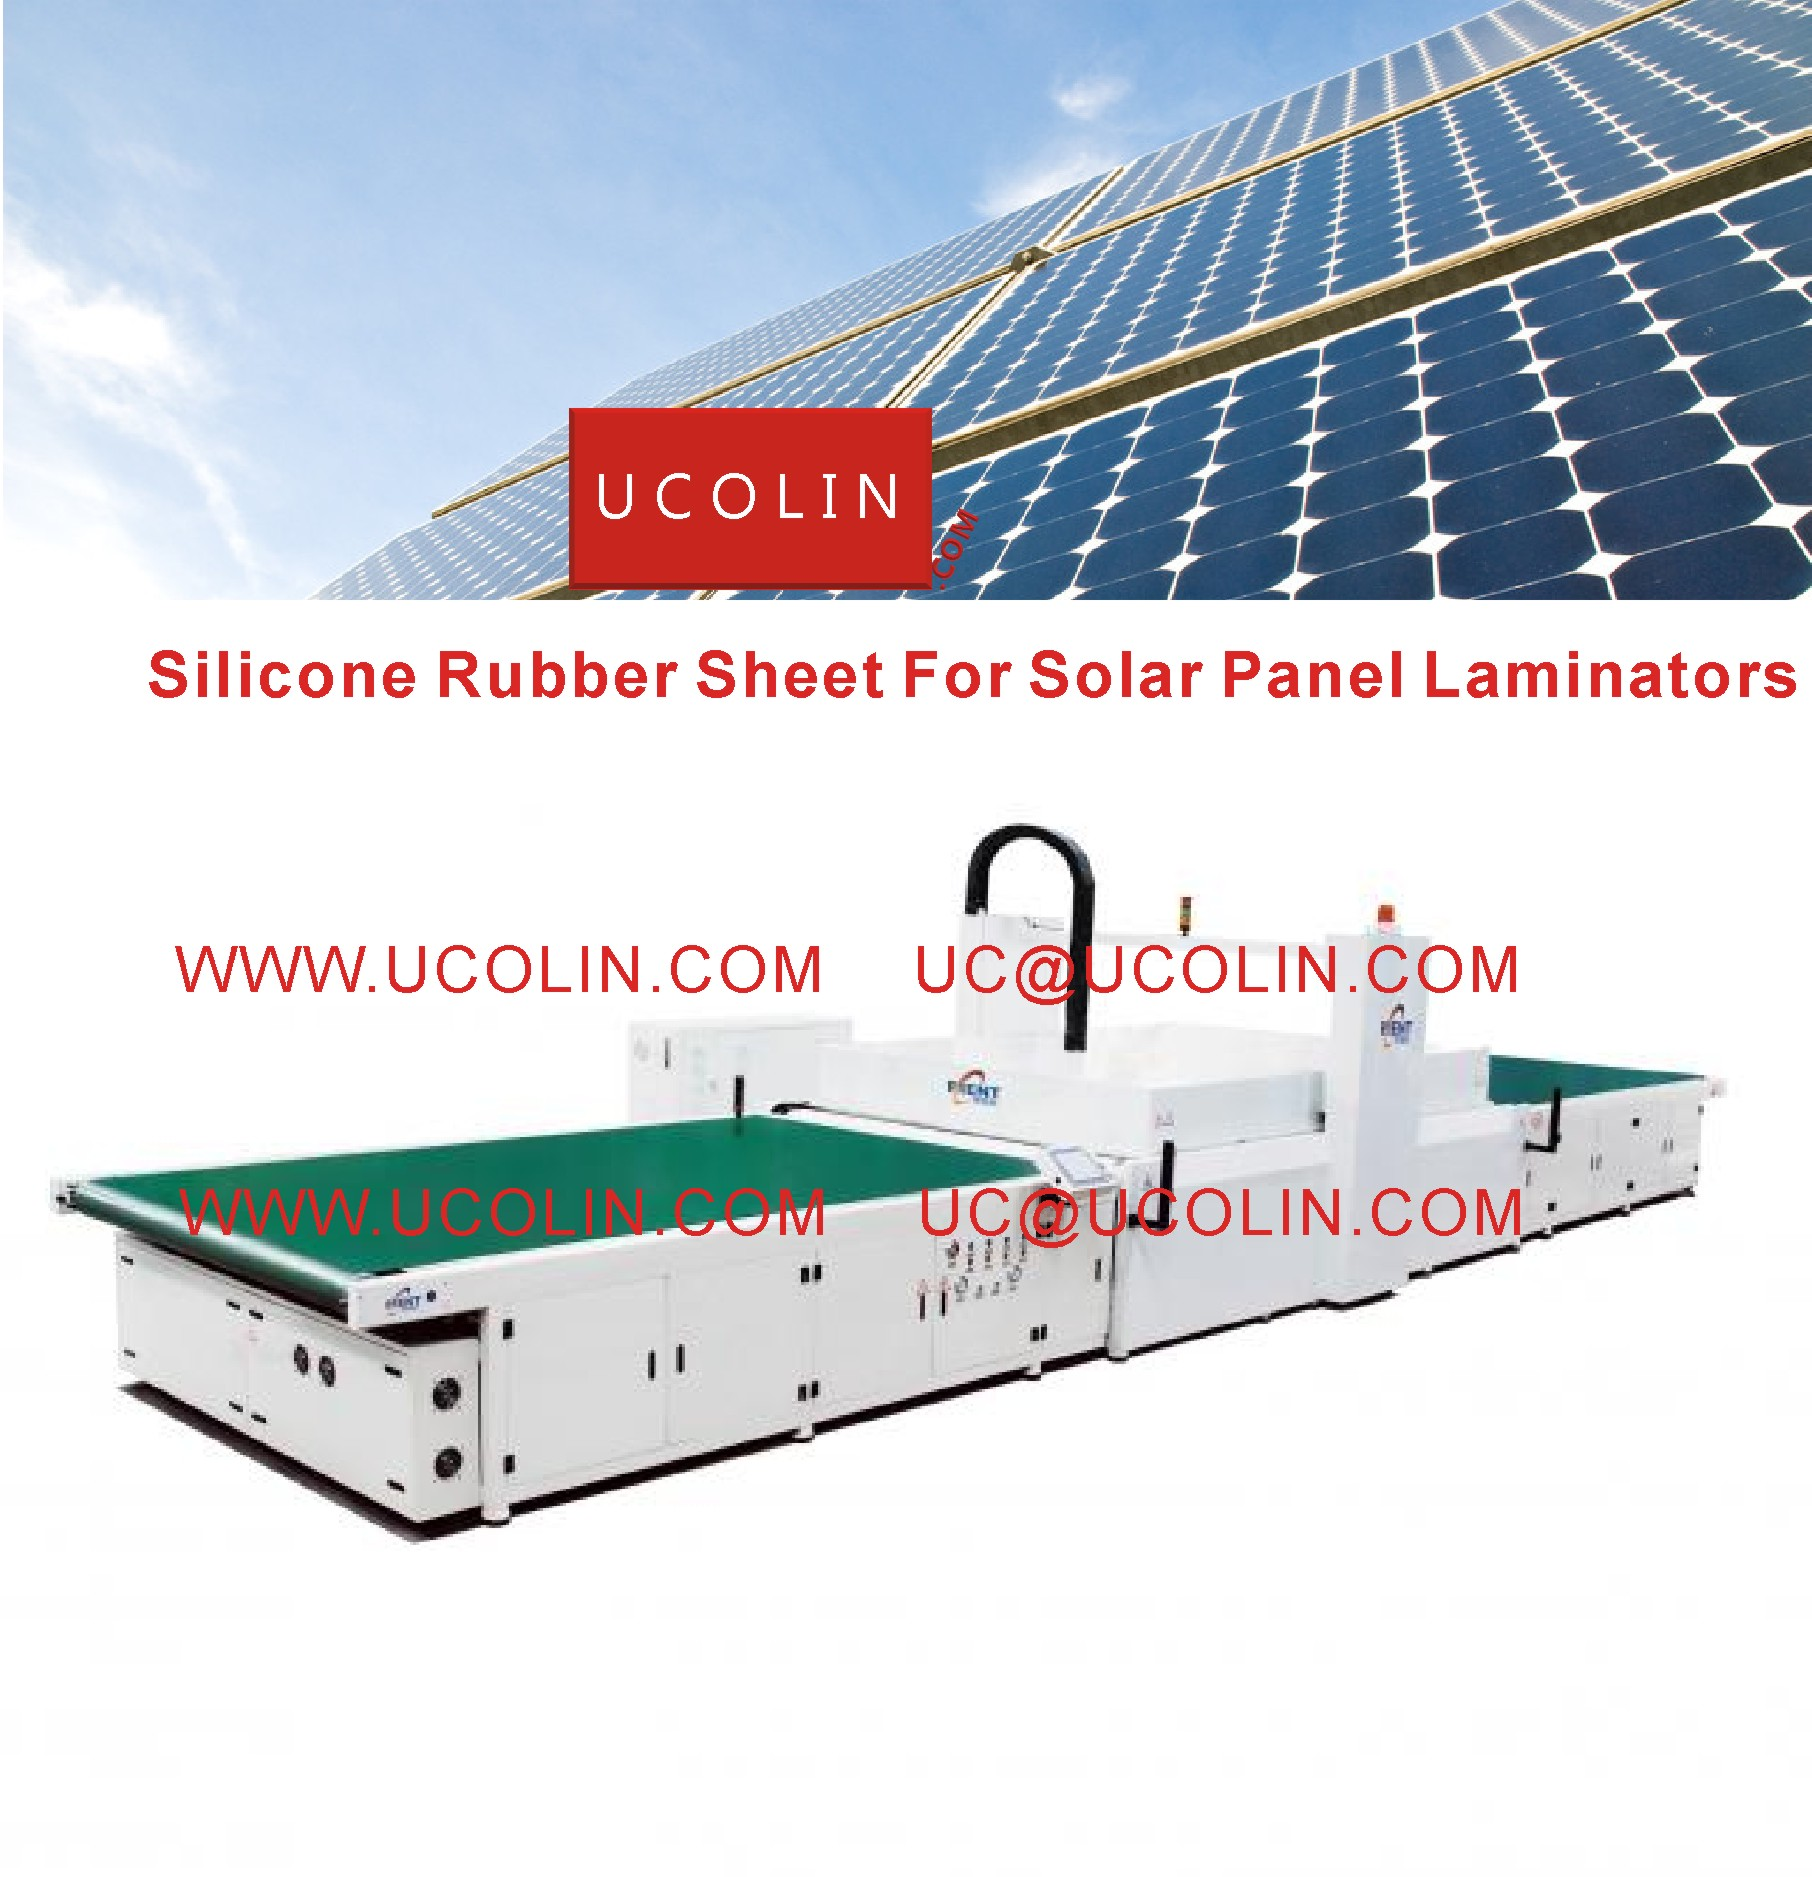 01 Silicon Rubber Sheet For Solar Panel Laminators